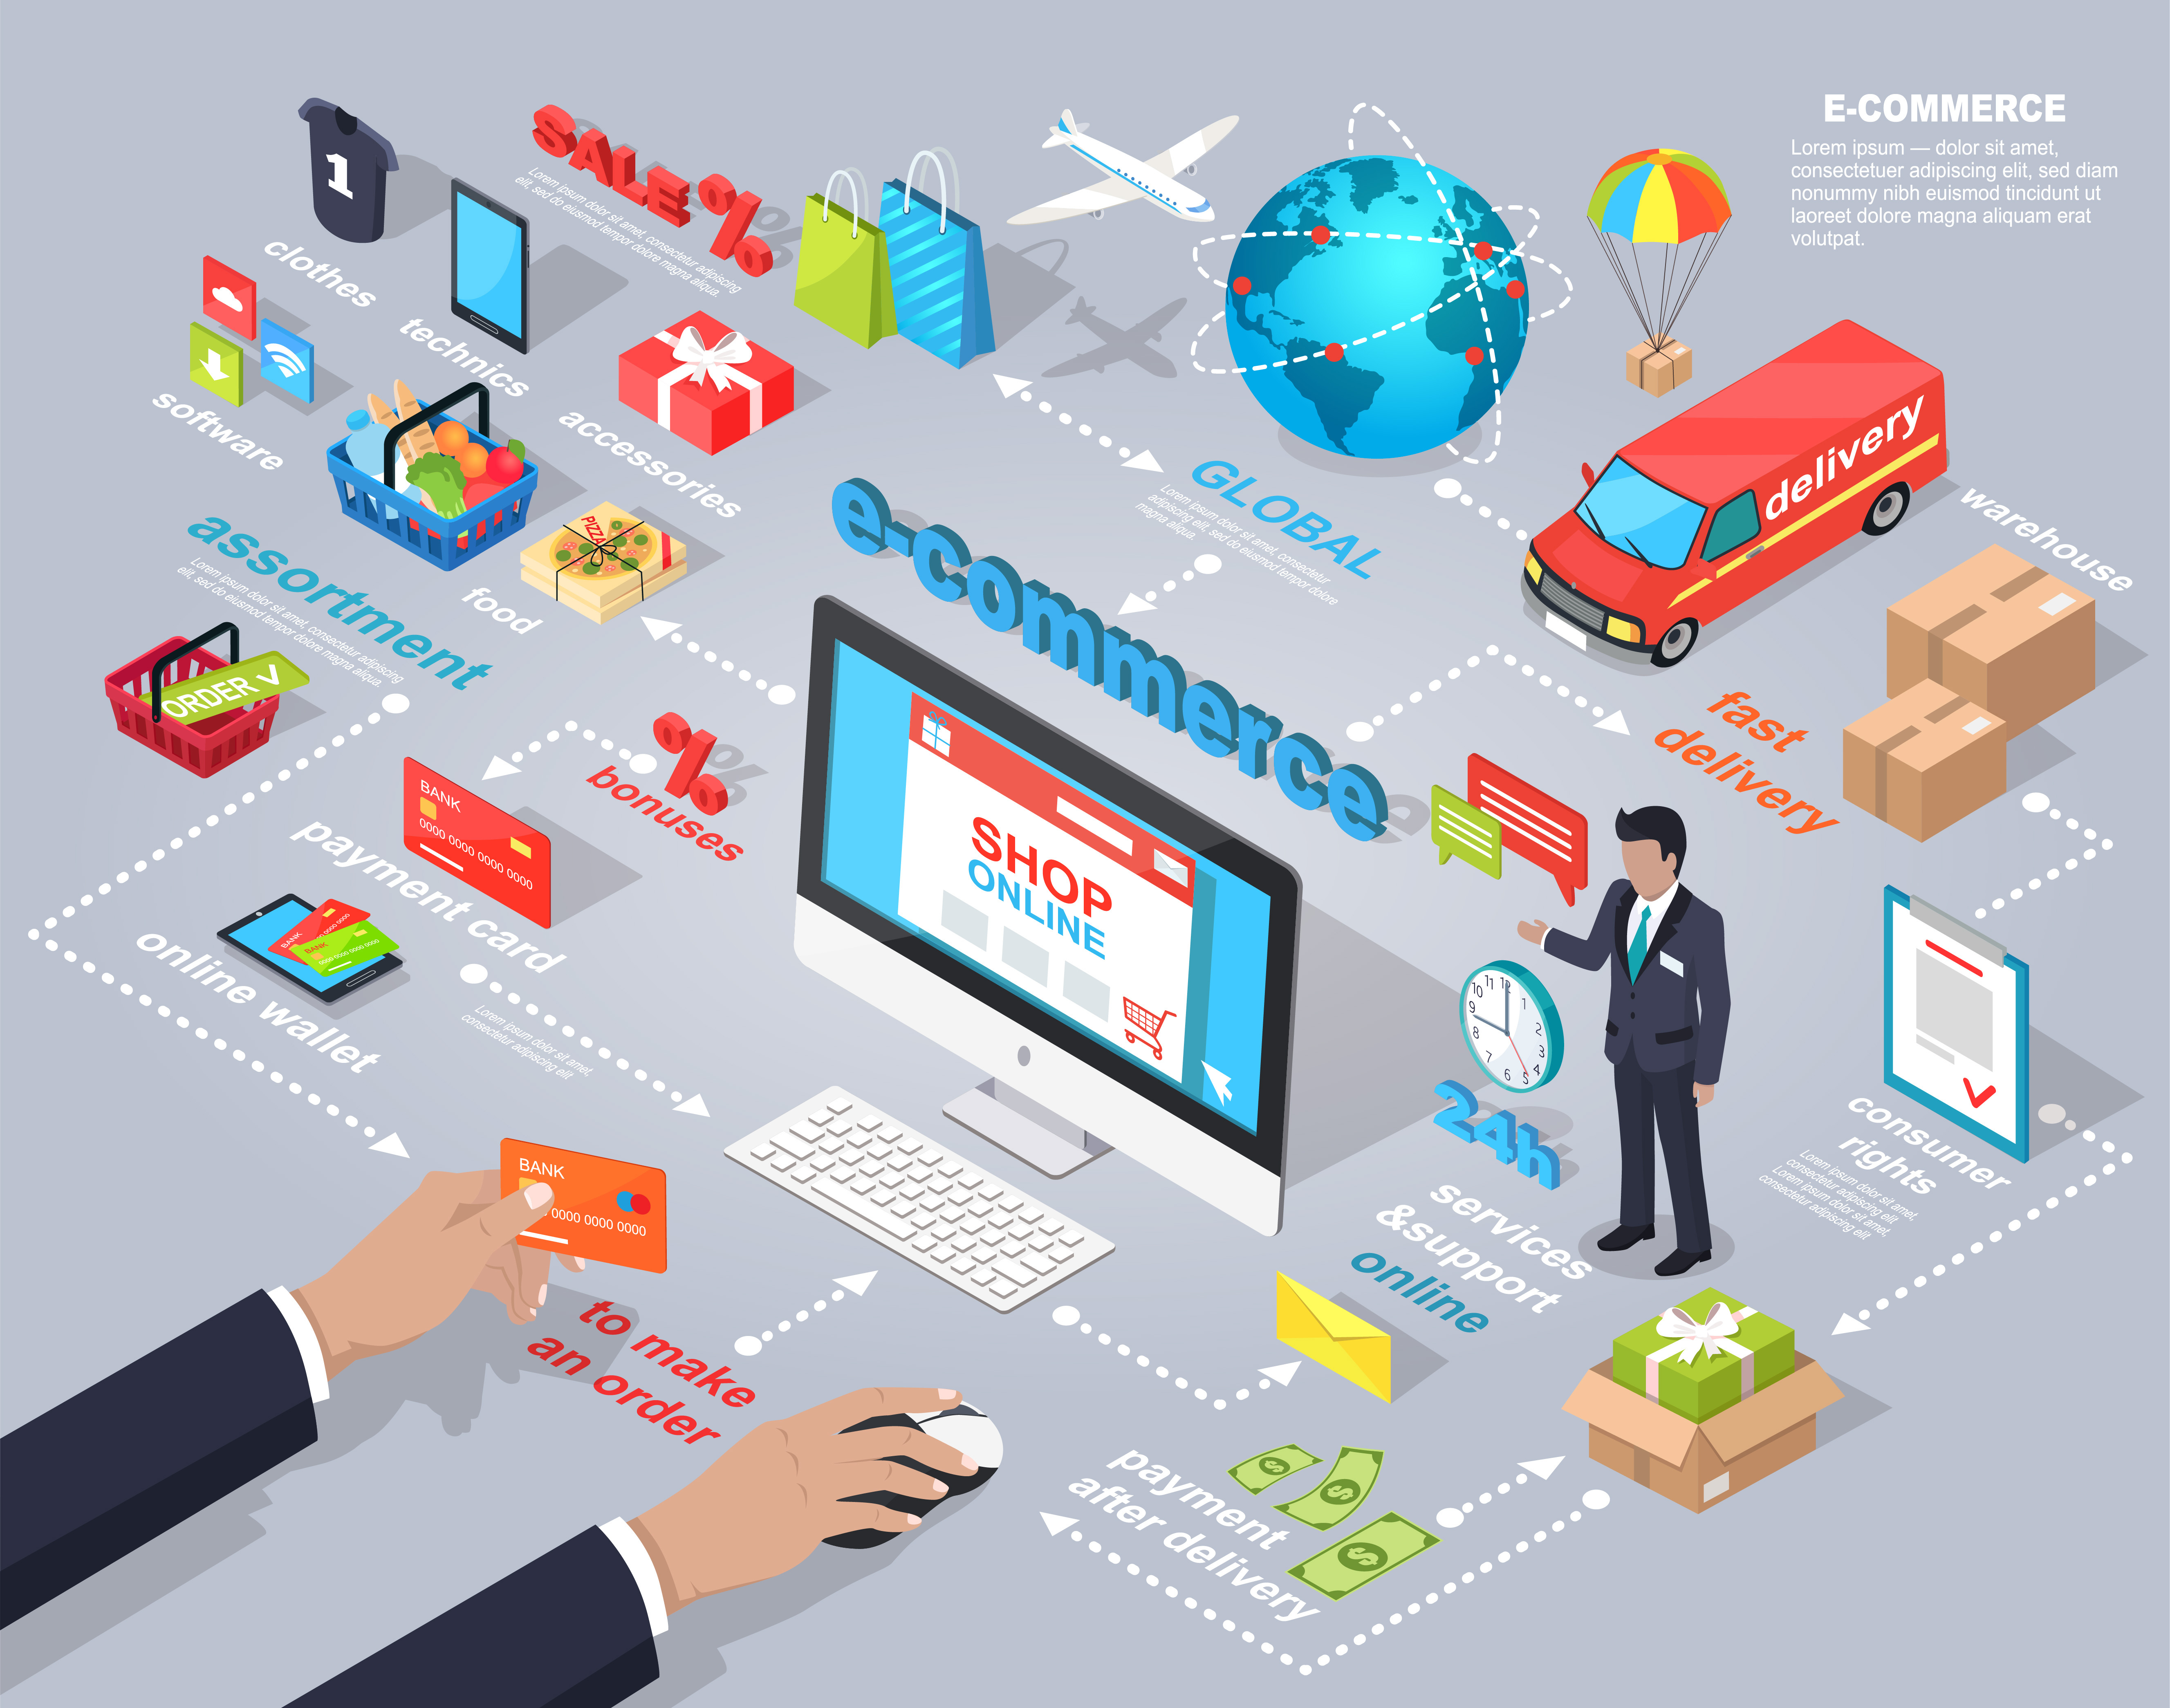 Line sheets, E-commerce, PLM software